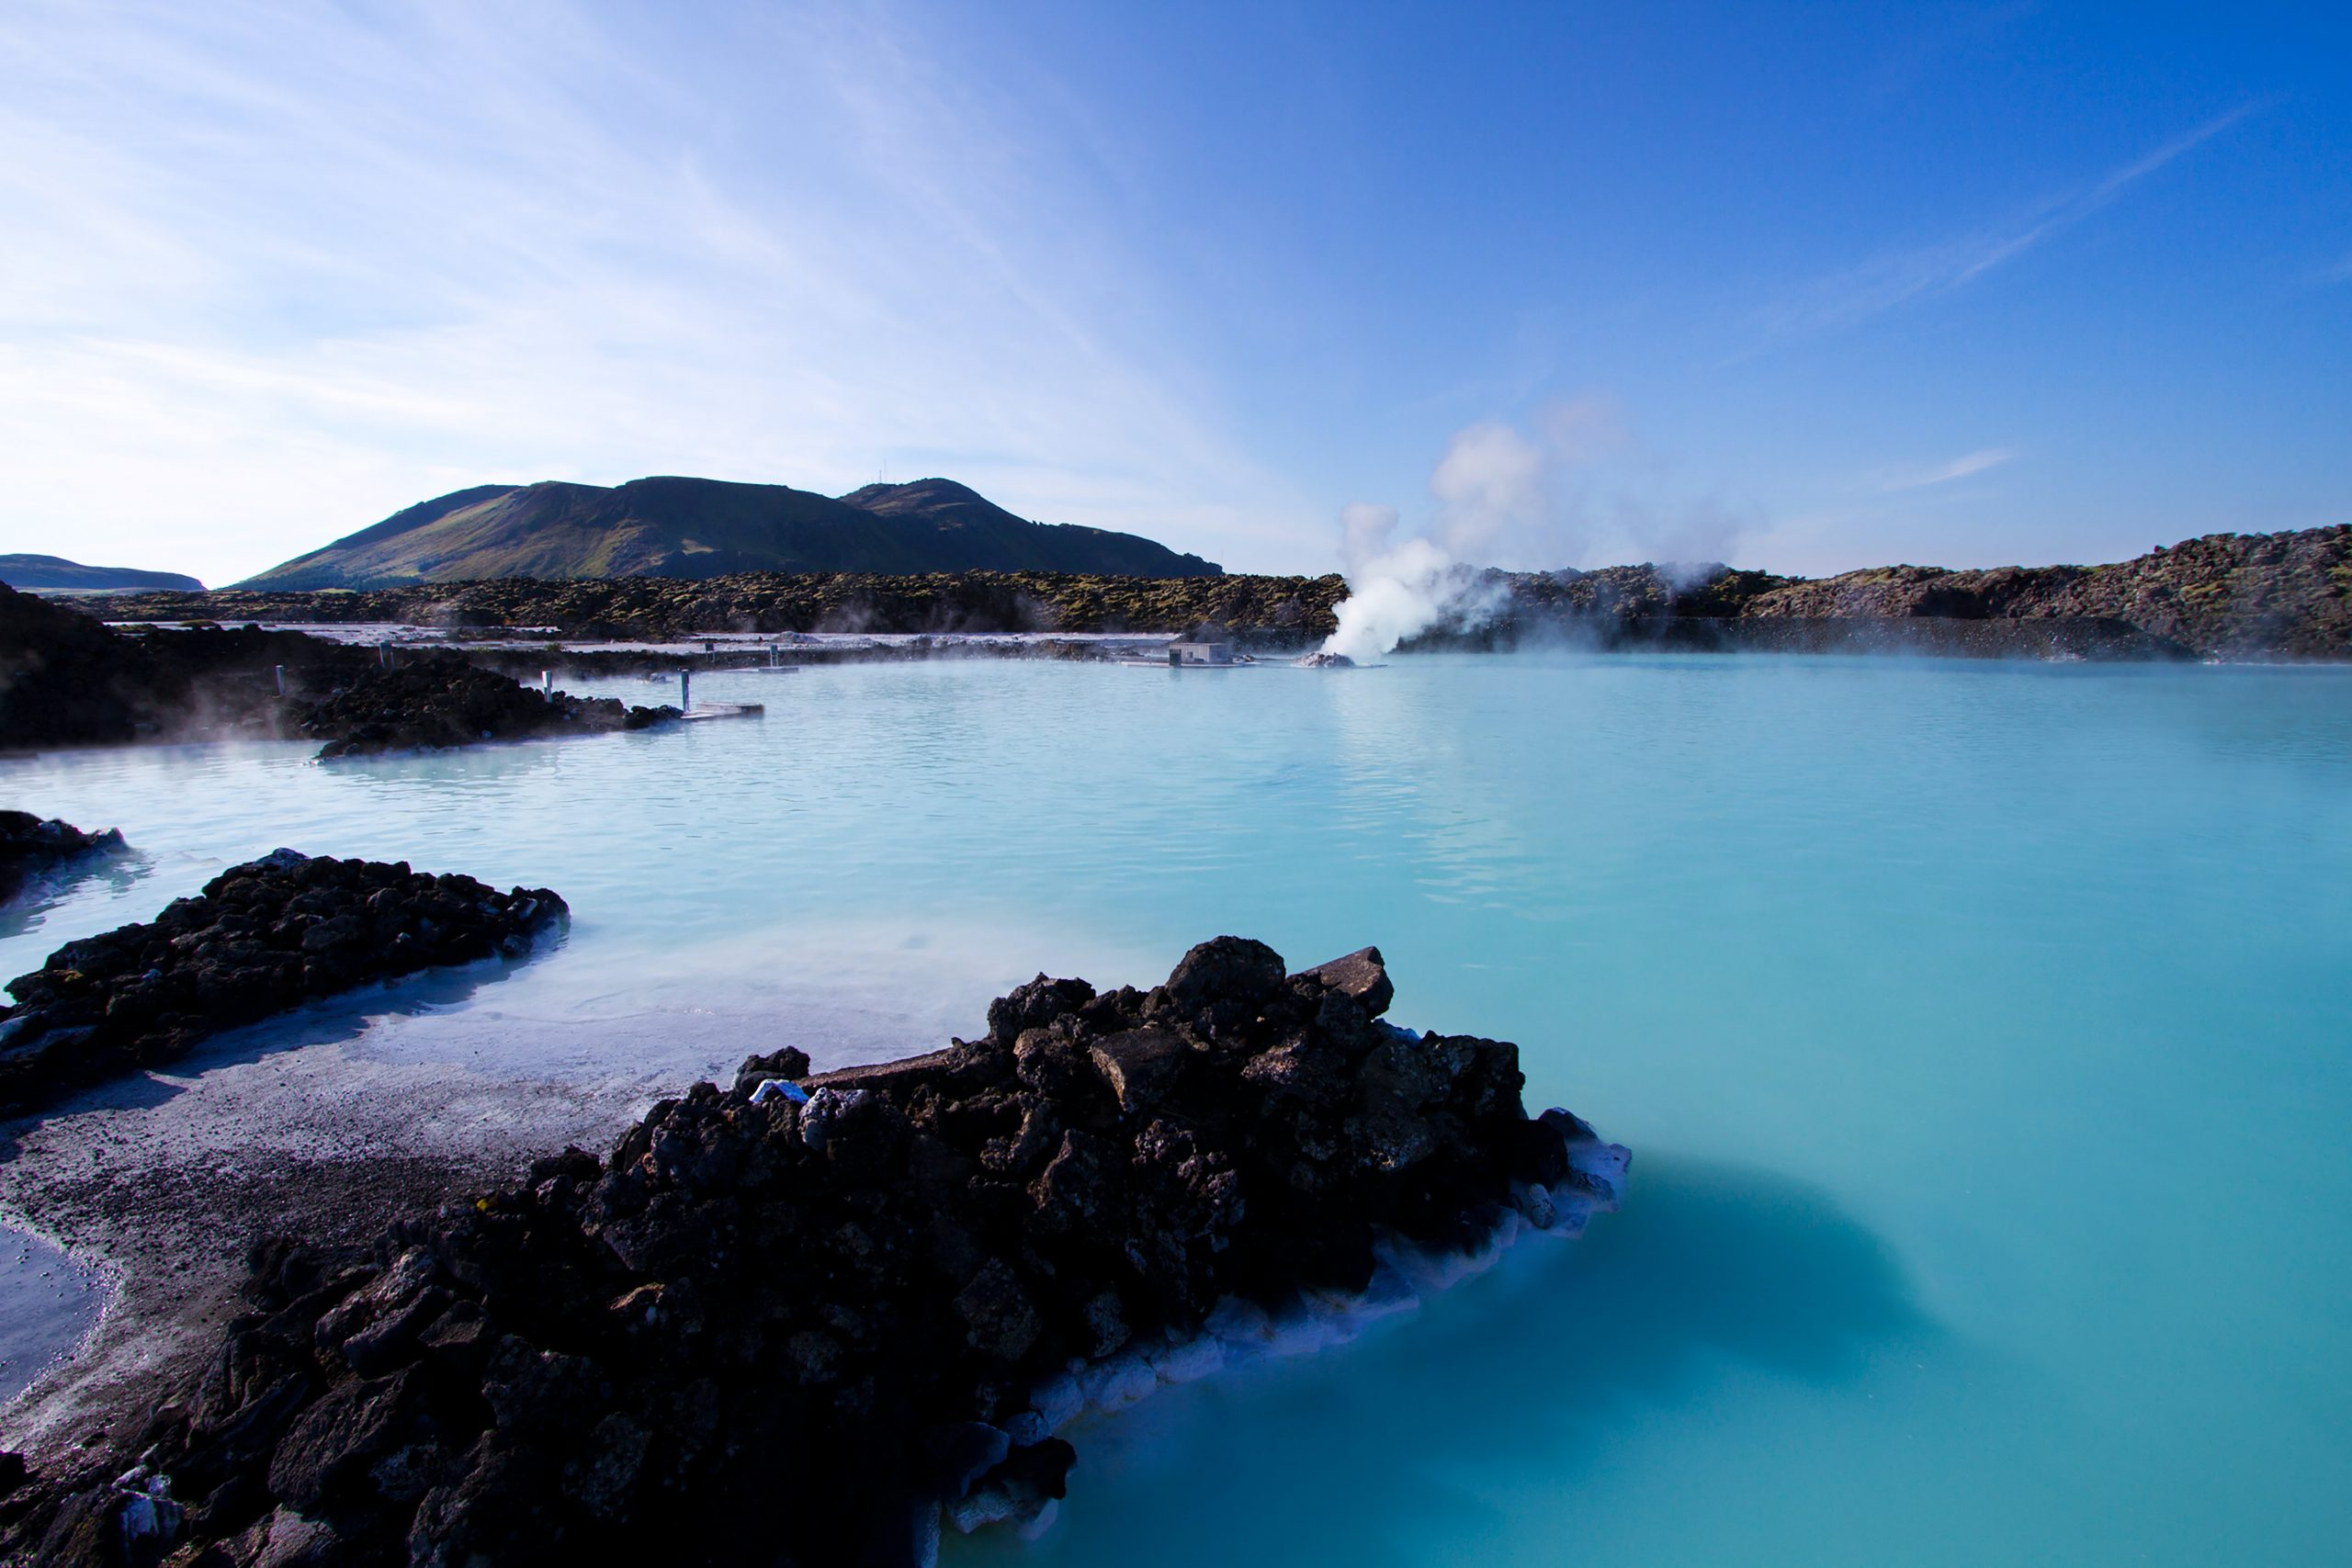 iceland-blue-lagoon-frank-denney-vCqclUnCg_8-unsplash